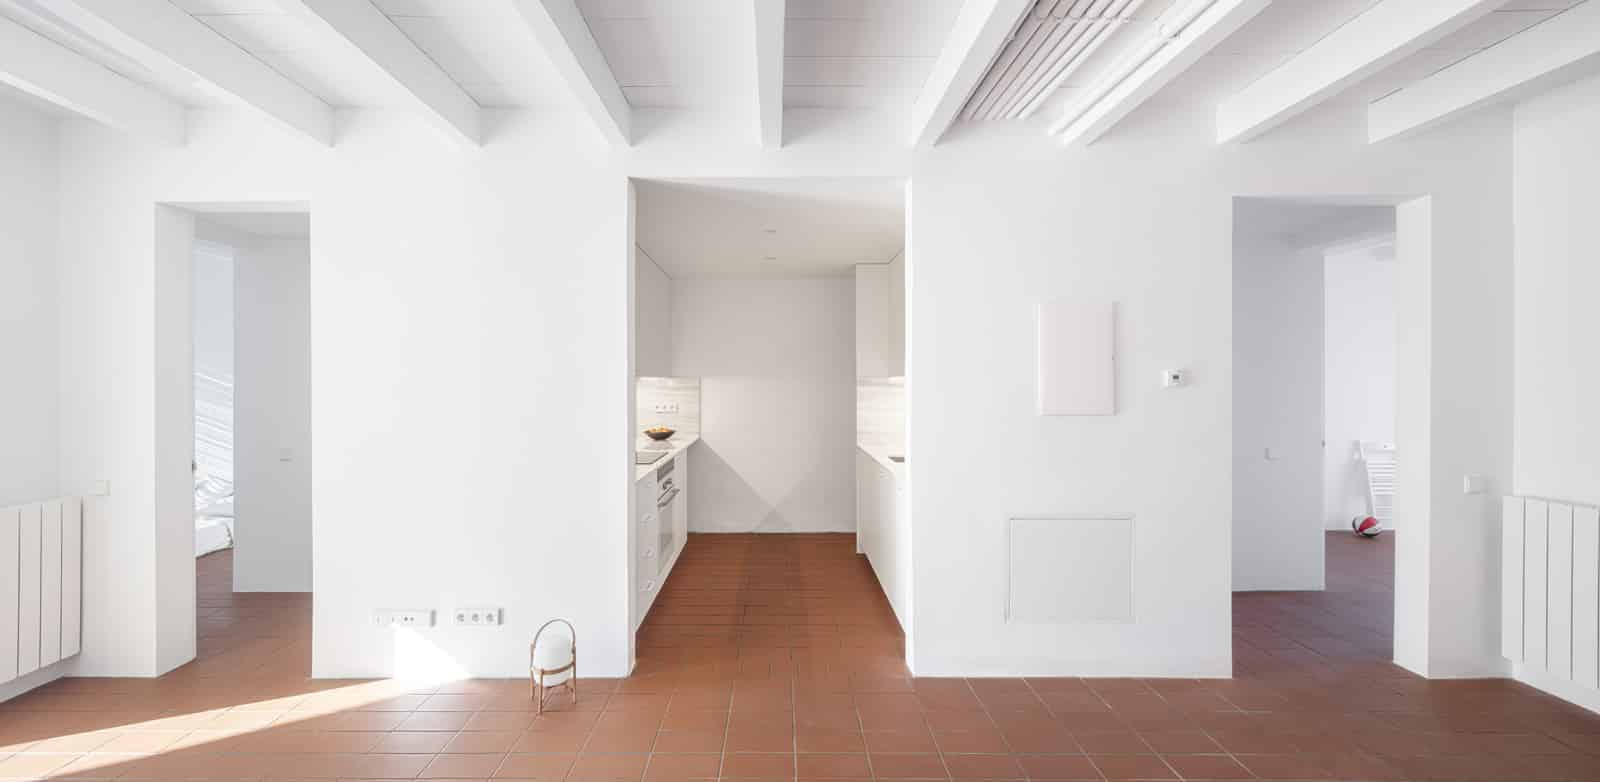 Habitatges Sant Pere de Ribes  - 20210617 DATAAE Habitatges 05 41